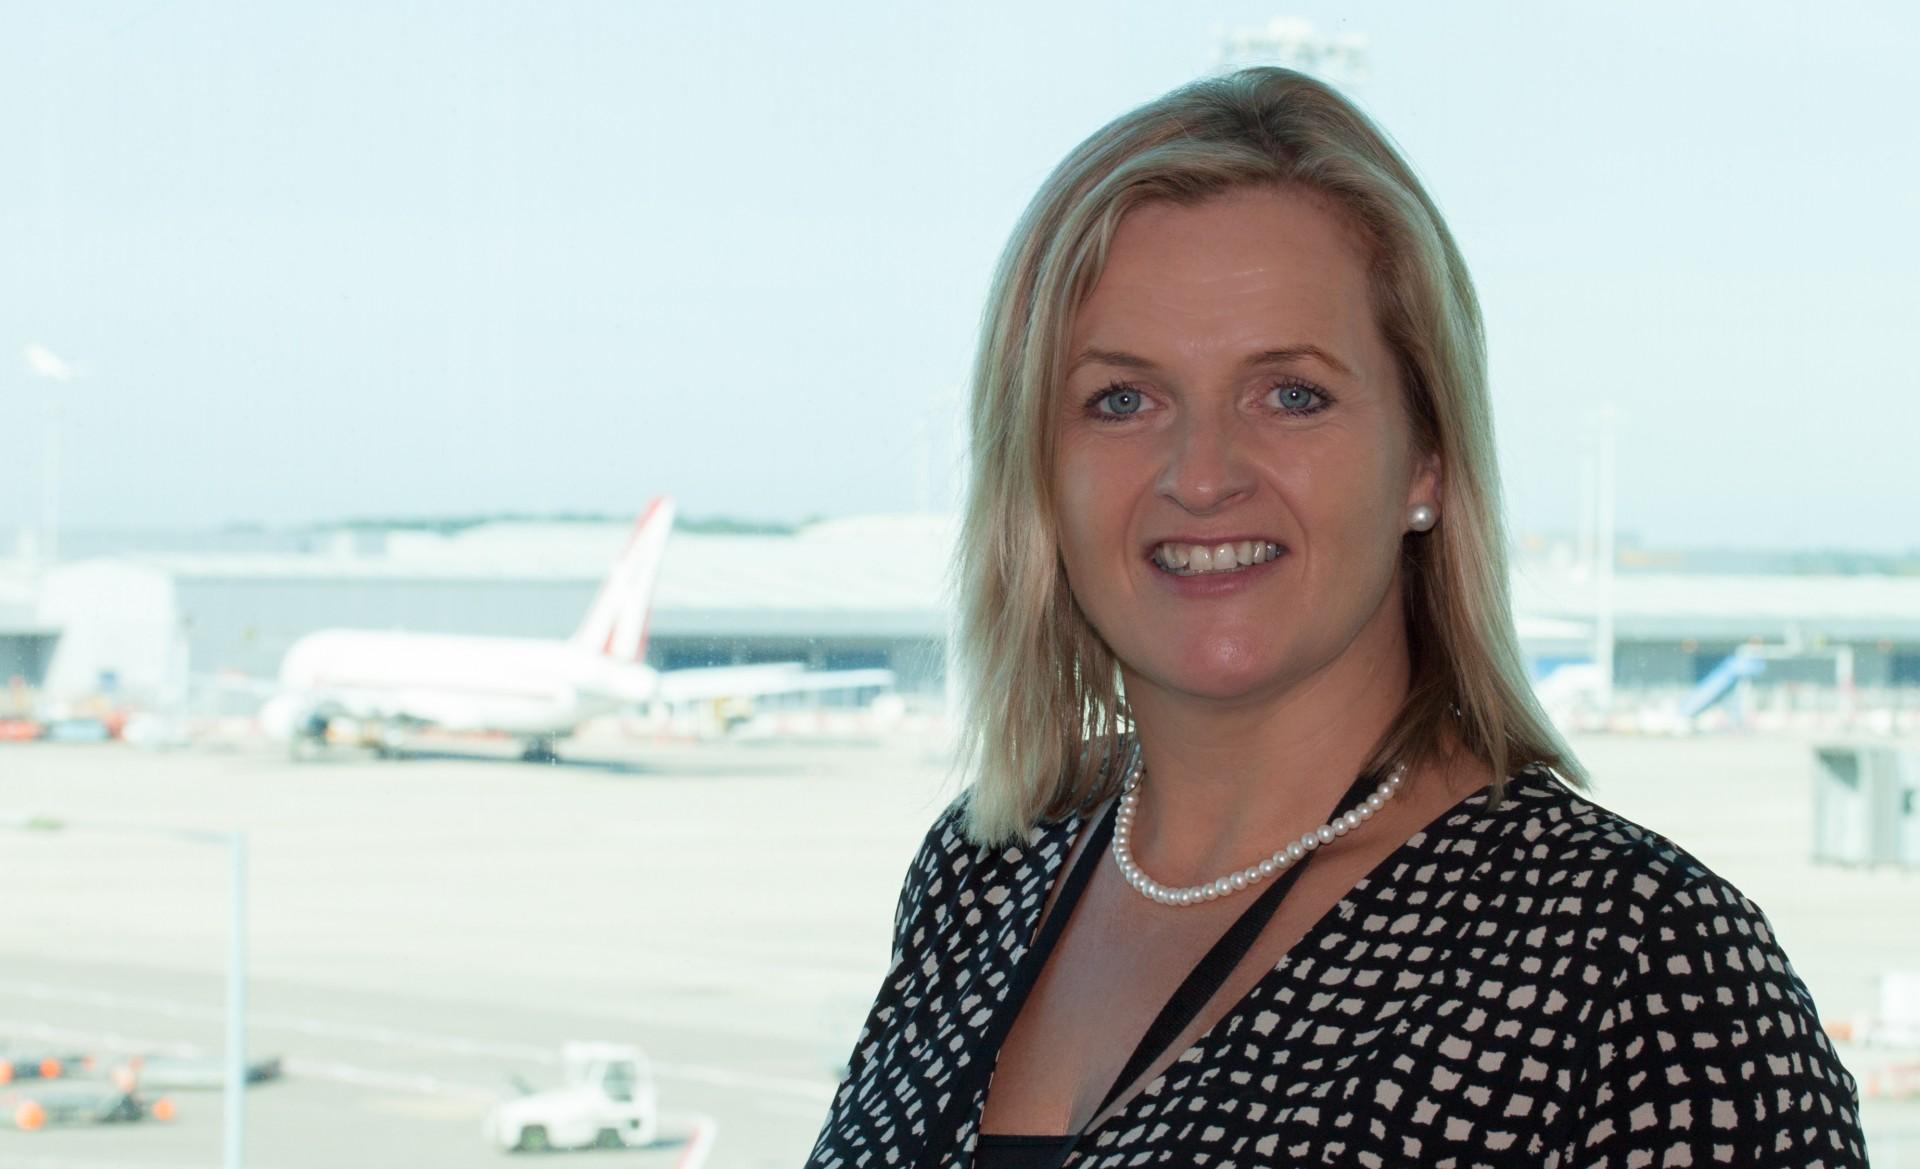 Karen smart appointed managing director of east midlands airport m4hsunfo